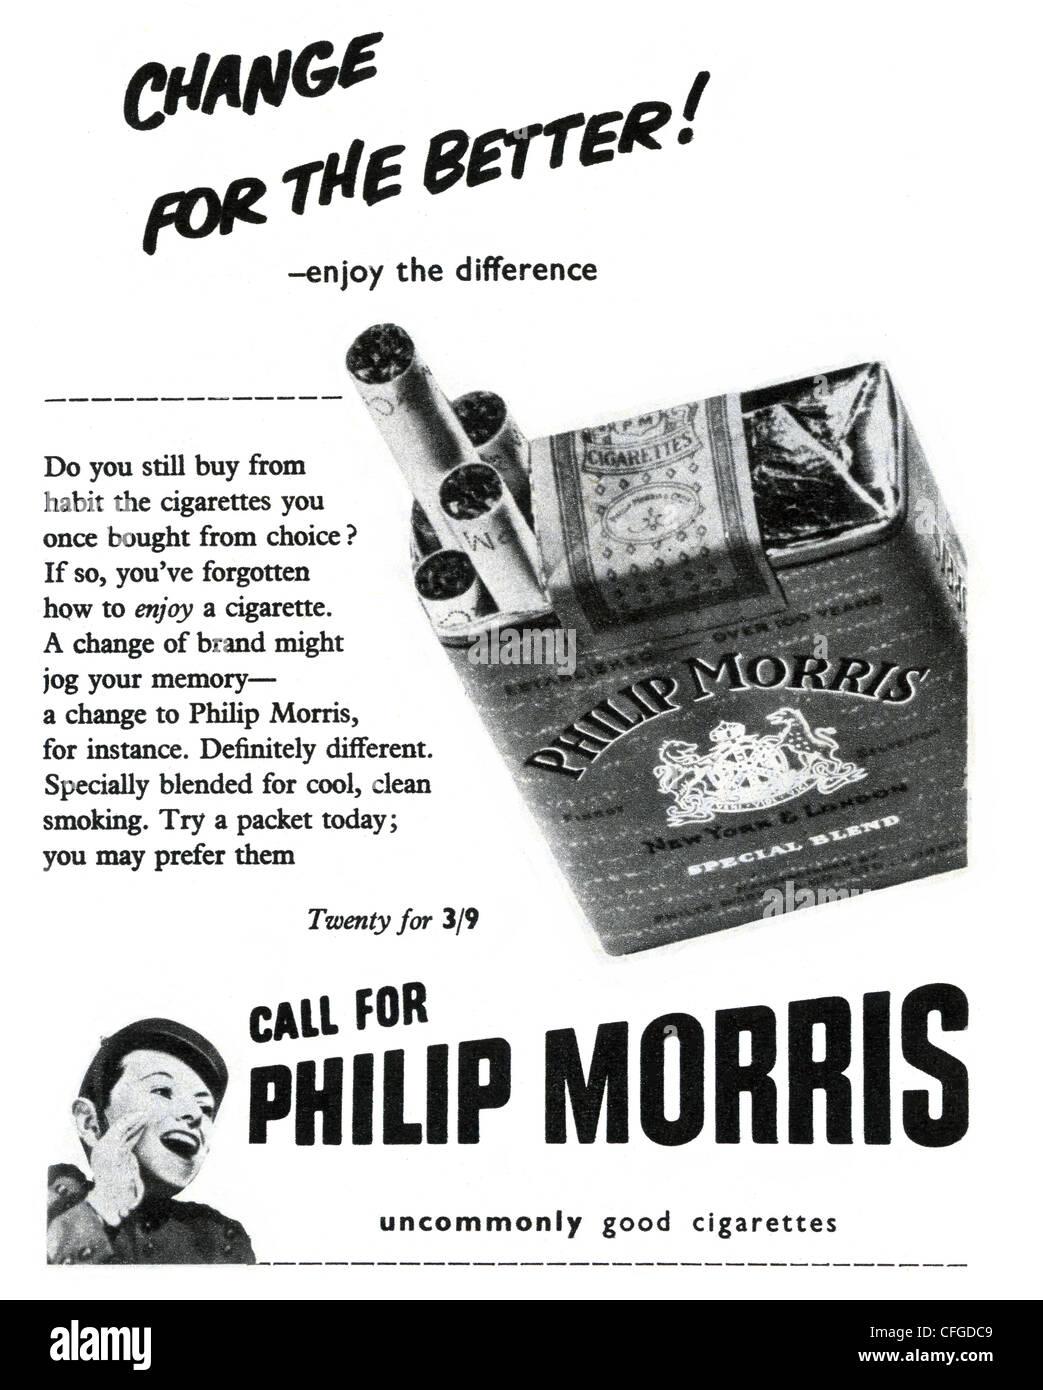 Philip Morris cigarette advert from 1953 - Stock Image